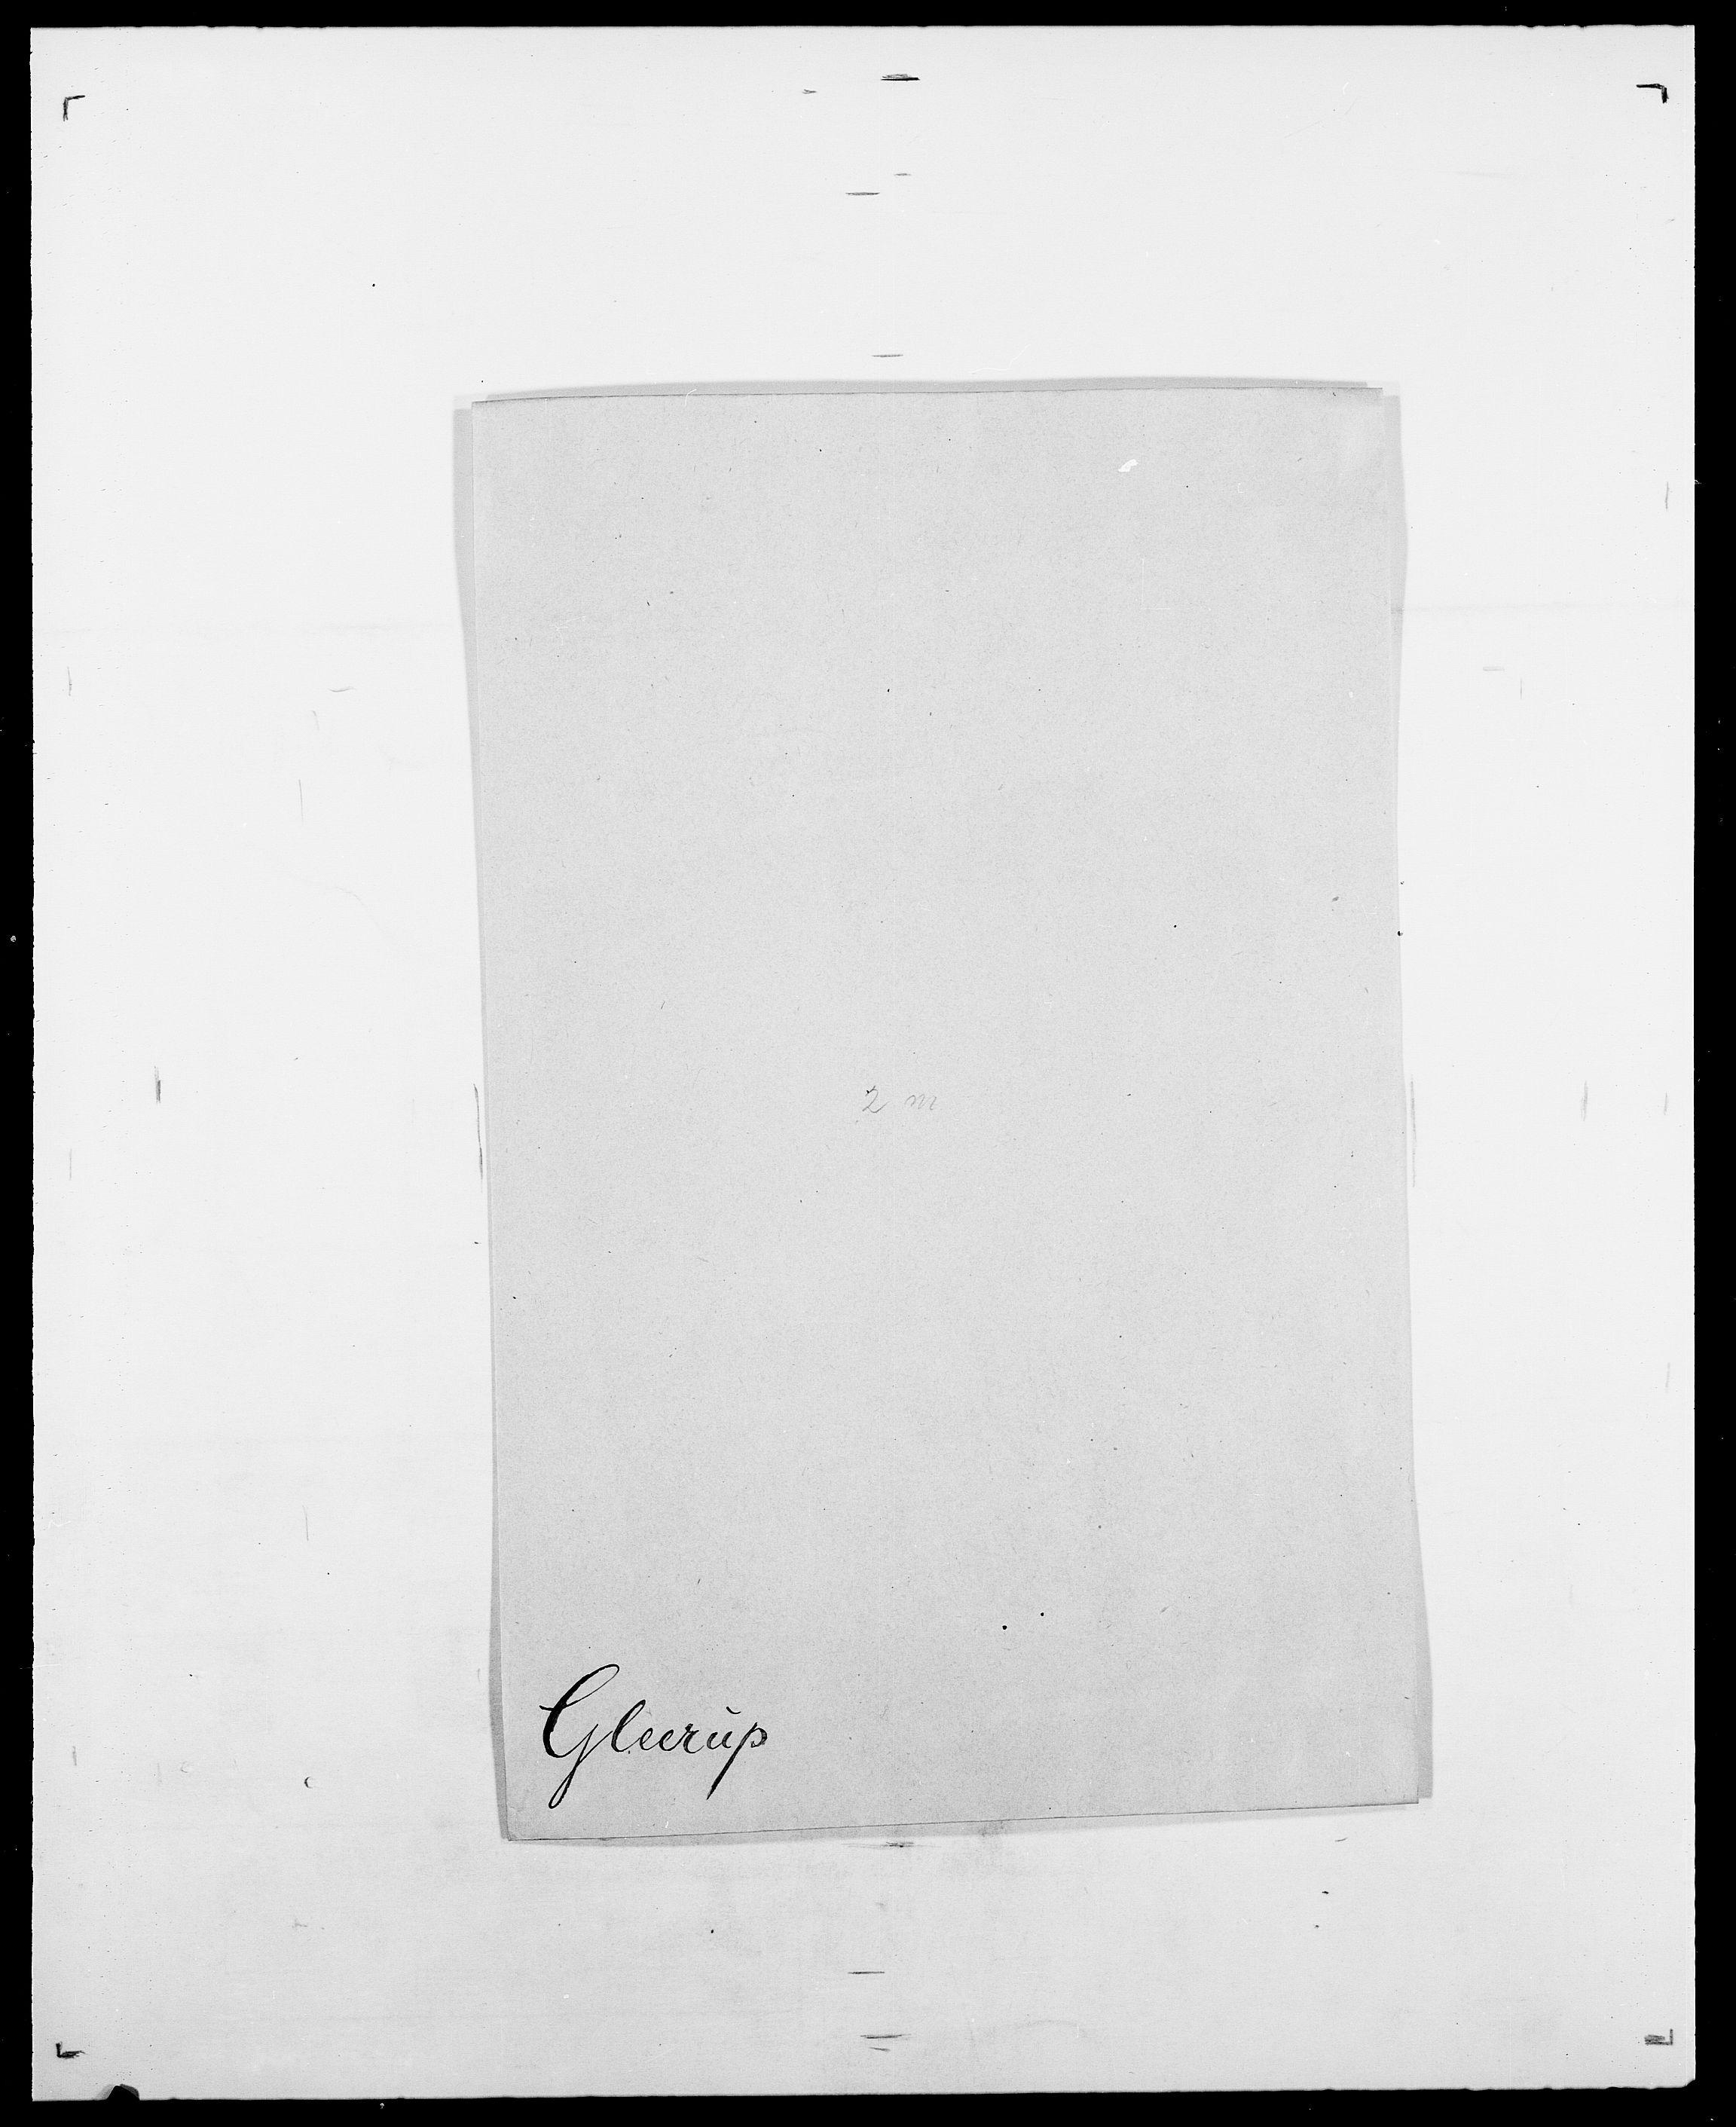 SAO, Delgobe, Charles Antoine - samling, D/Da/L0014: Giebdhausen - Grip, s. 311